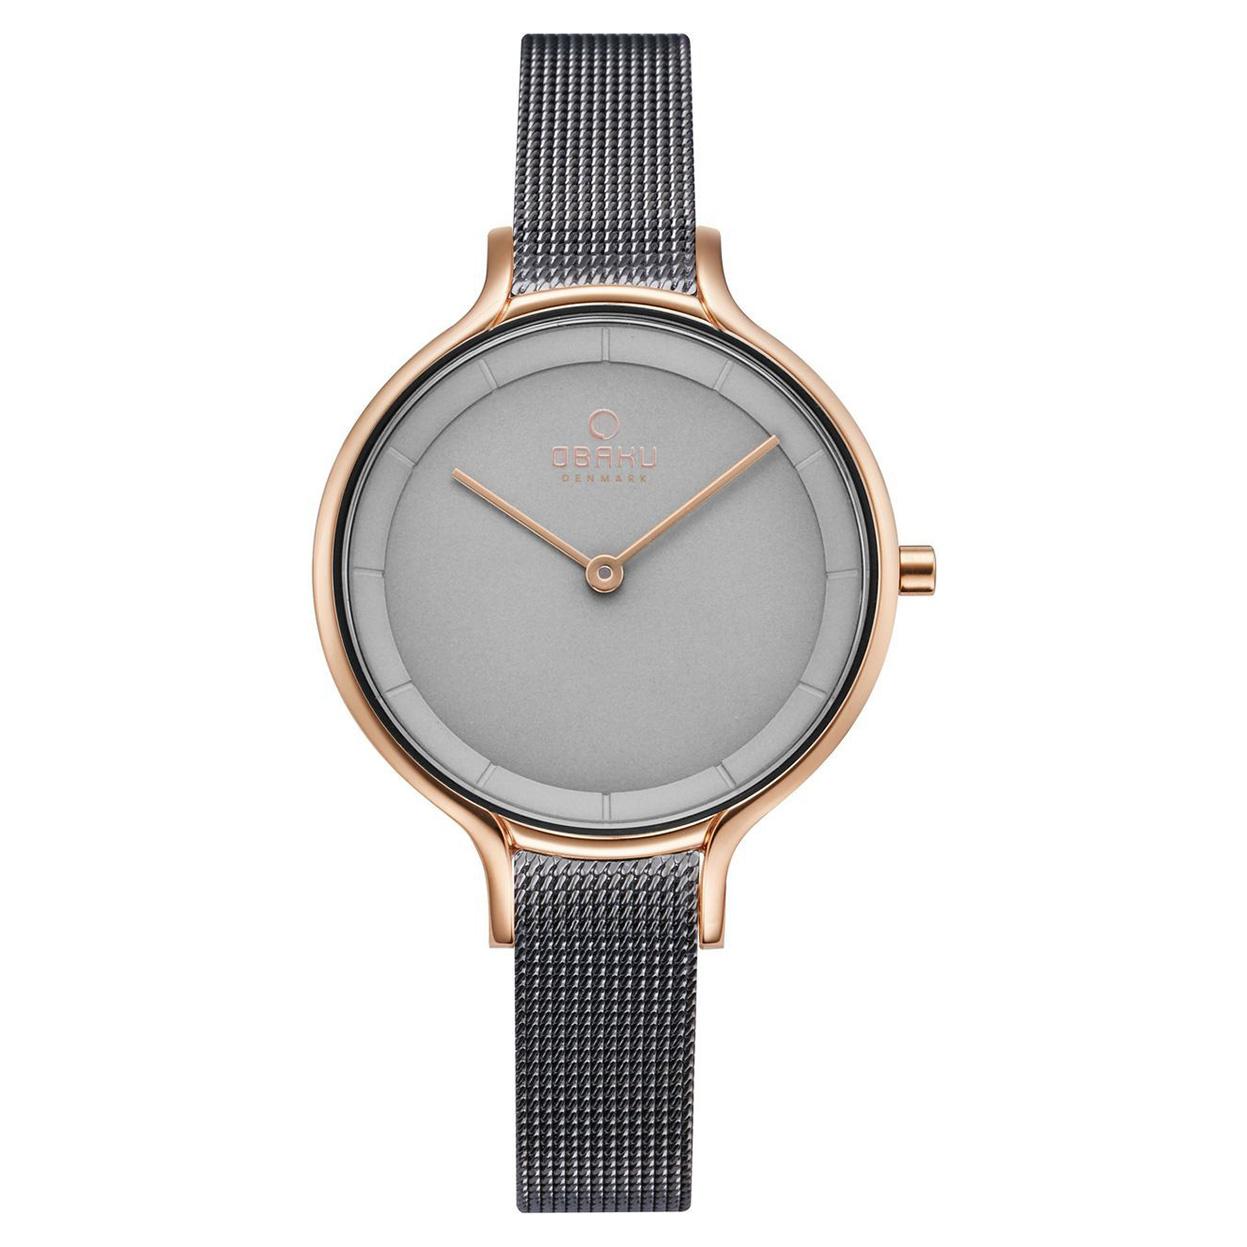 Zegarek Obaku V228LXVJMJ - grawer na stalowej kopercie